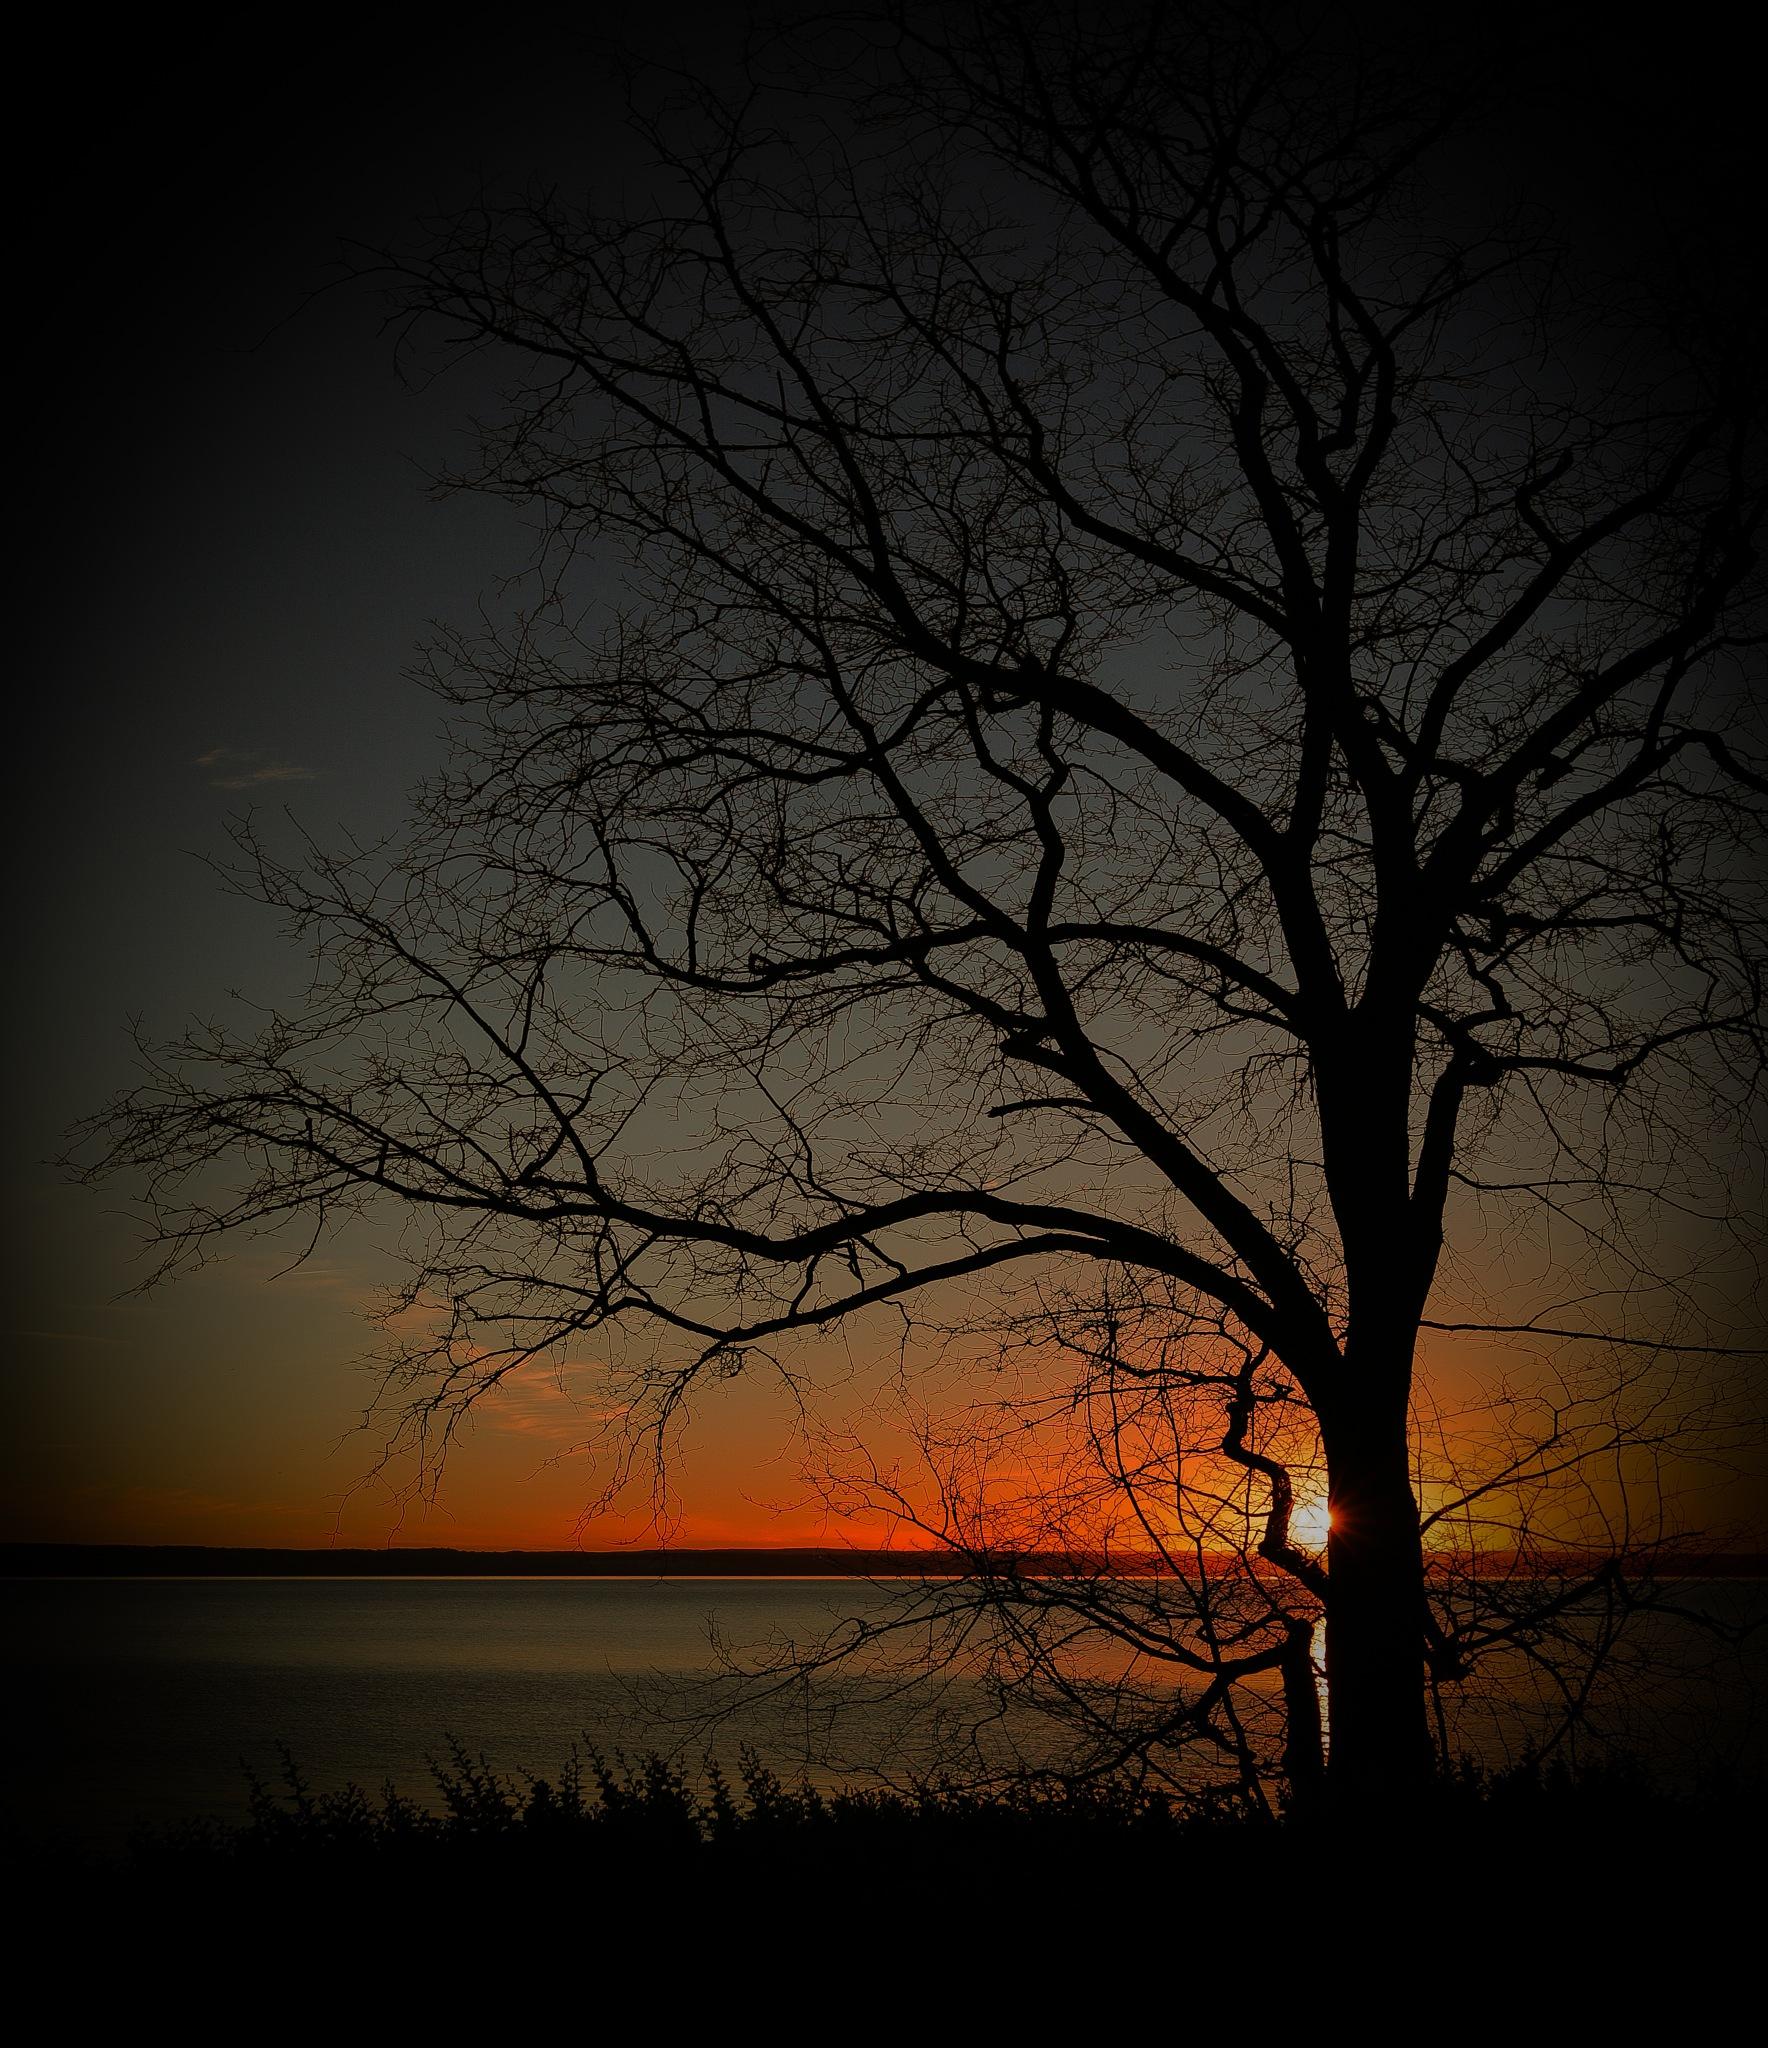 Tree & Sunset by abi.doroud